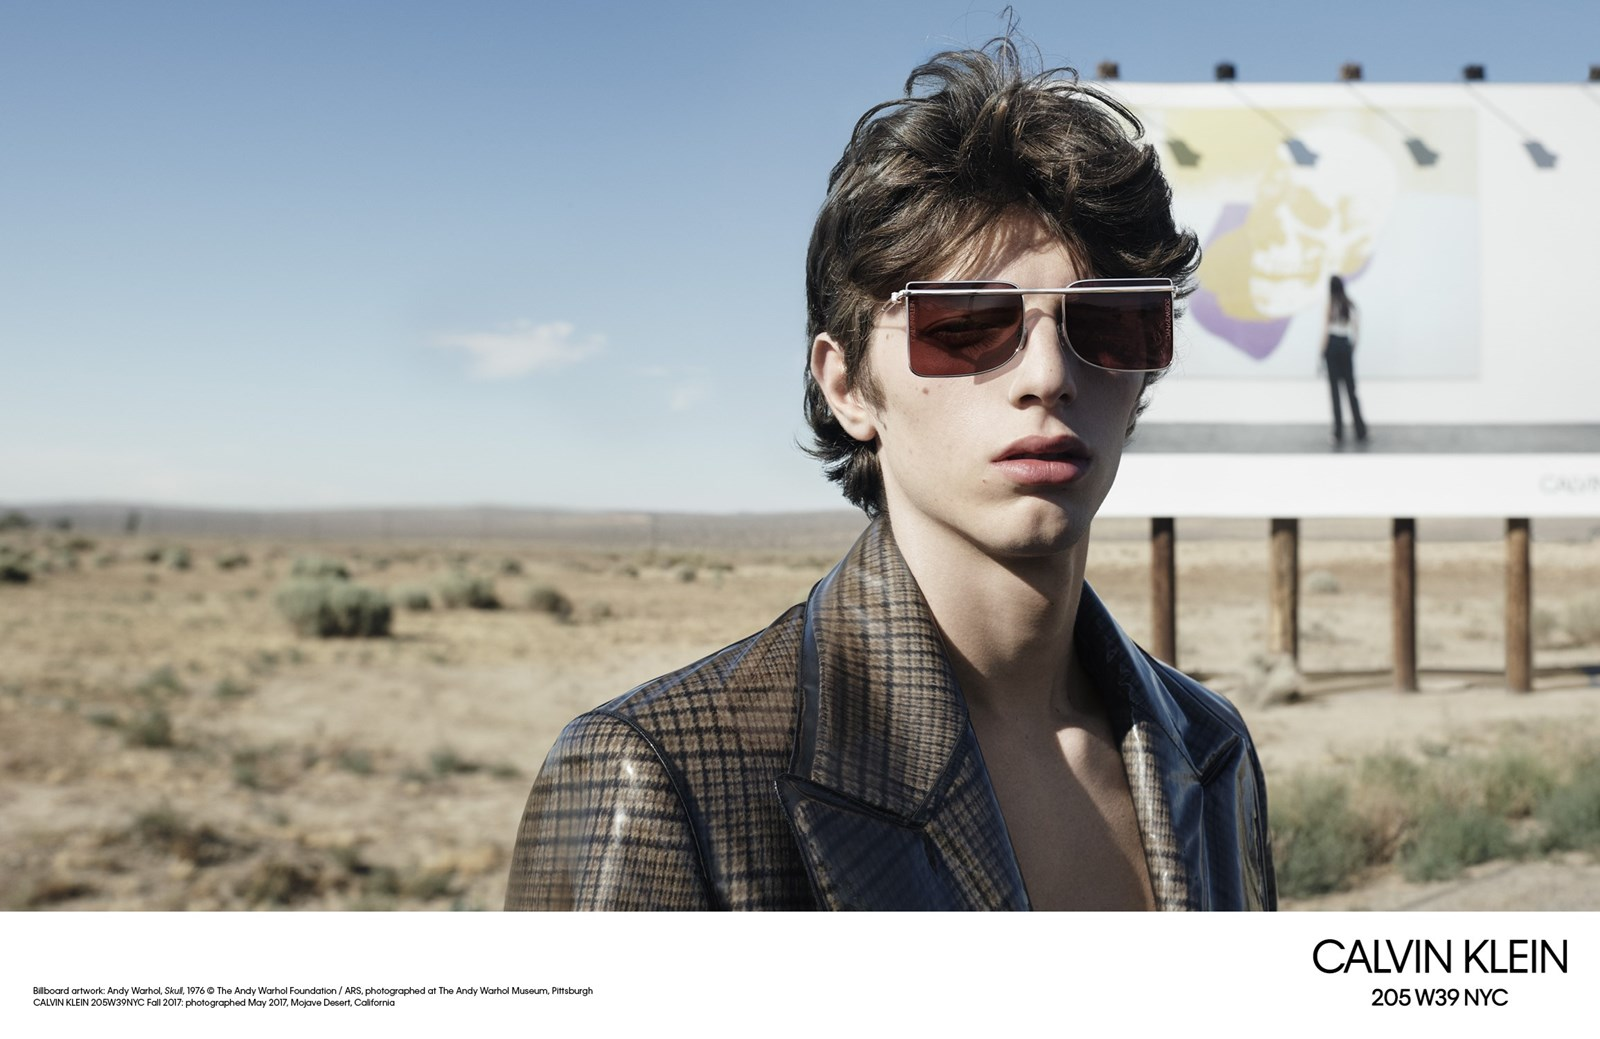 Raf Simons First Campaign for Calvin Klein